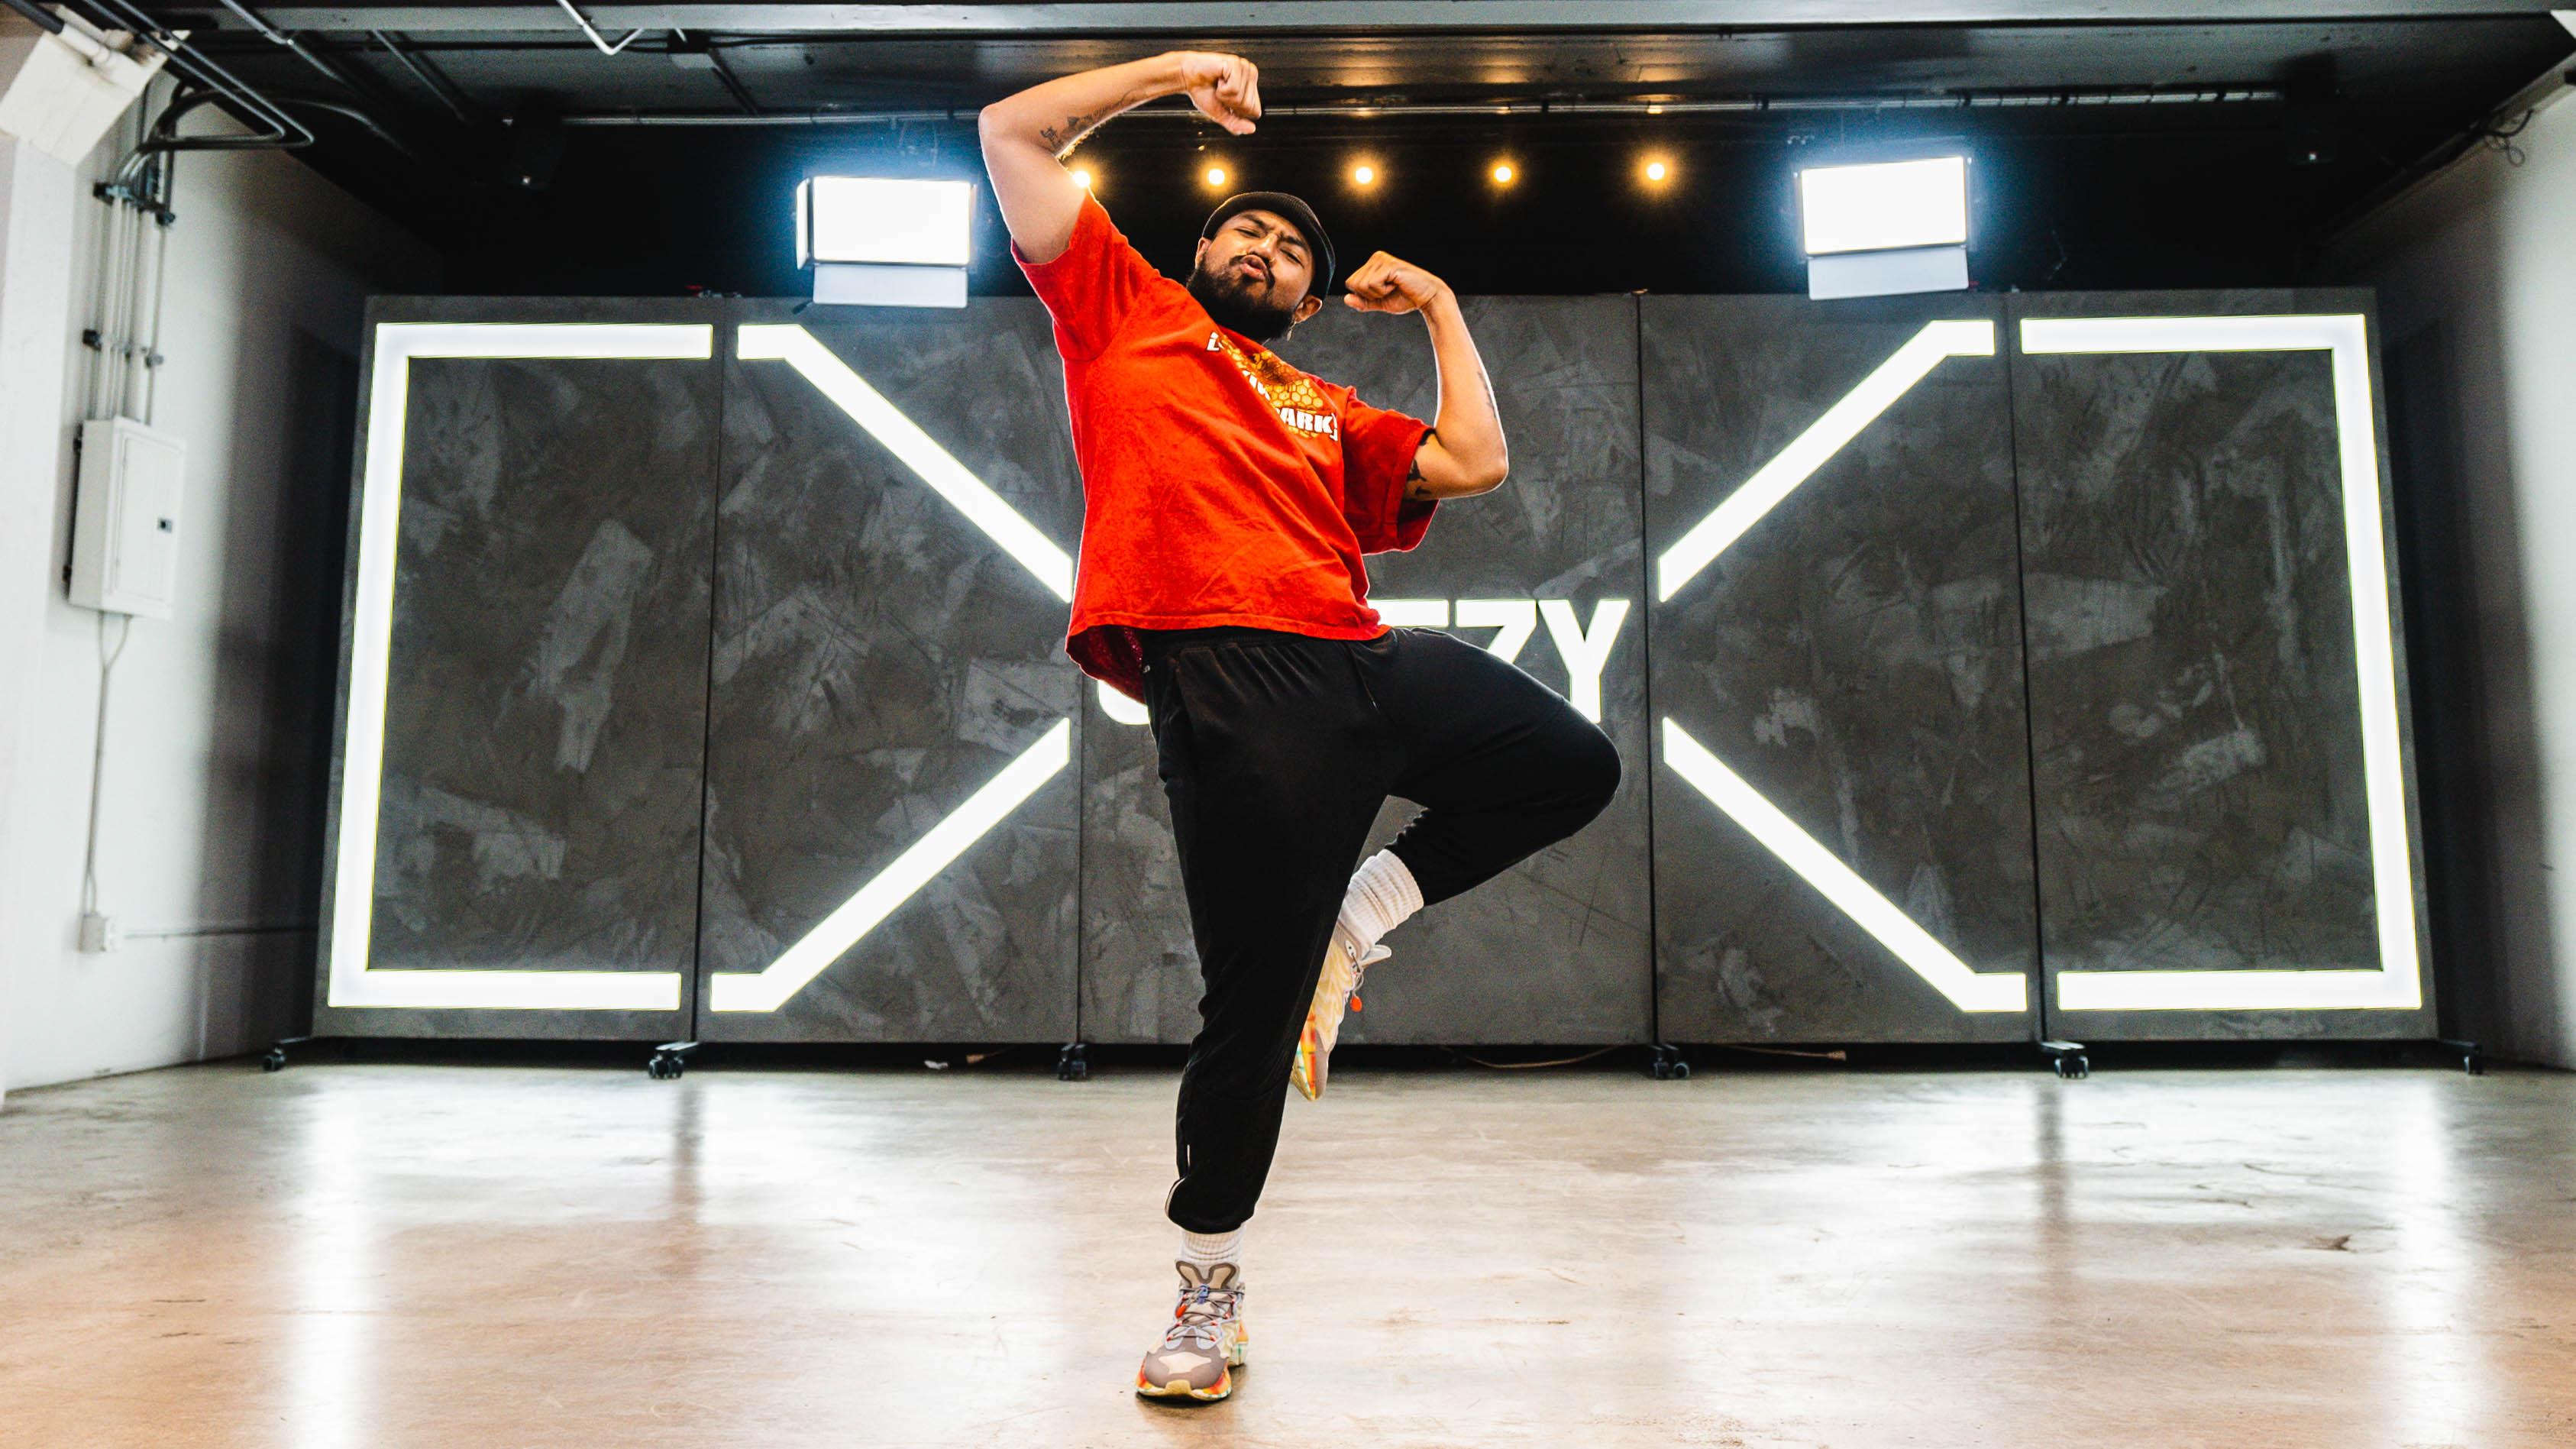 brandon beastboi doing the hit dem folks dance move